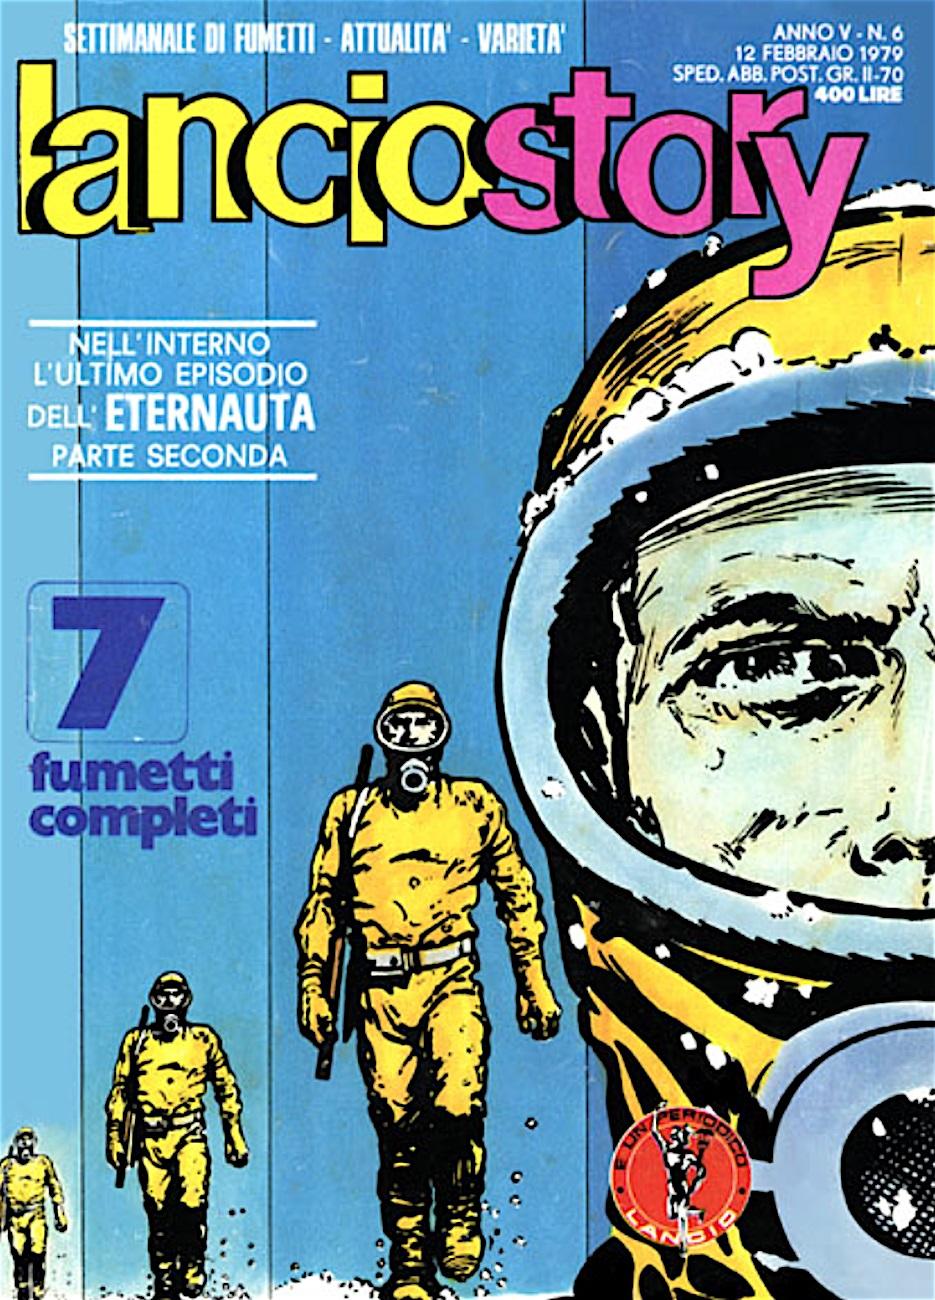 el eternauta serie netflix Héctor Oesterheld